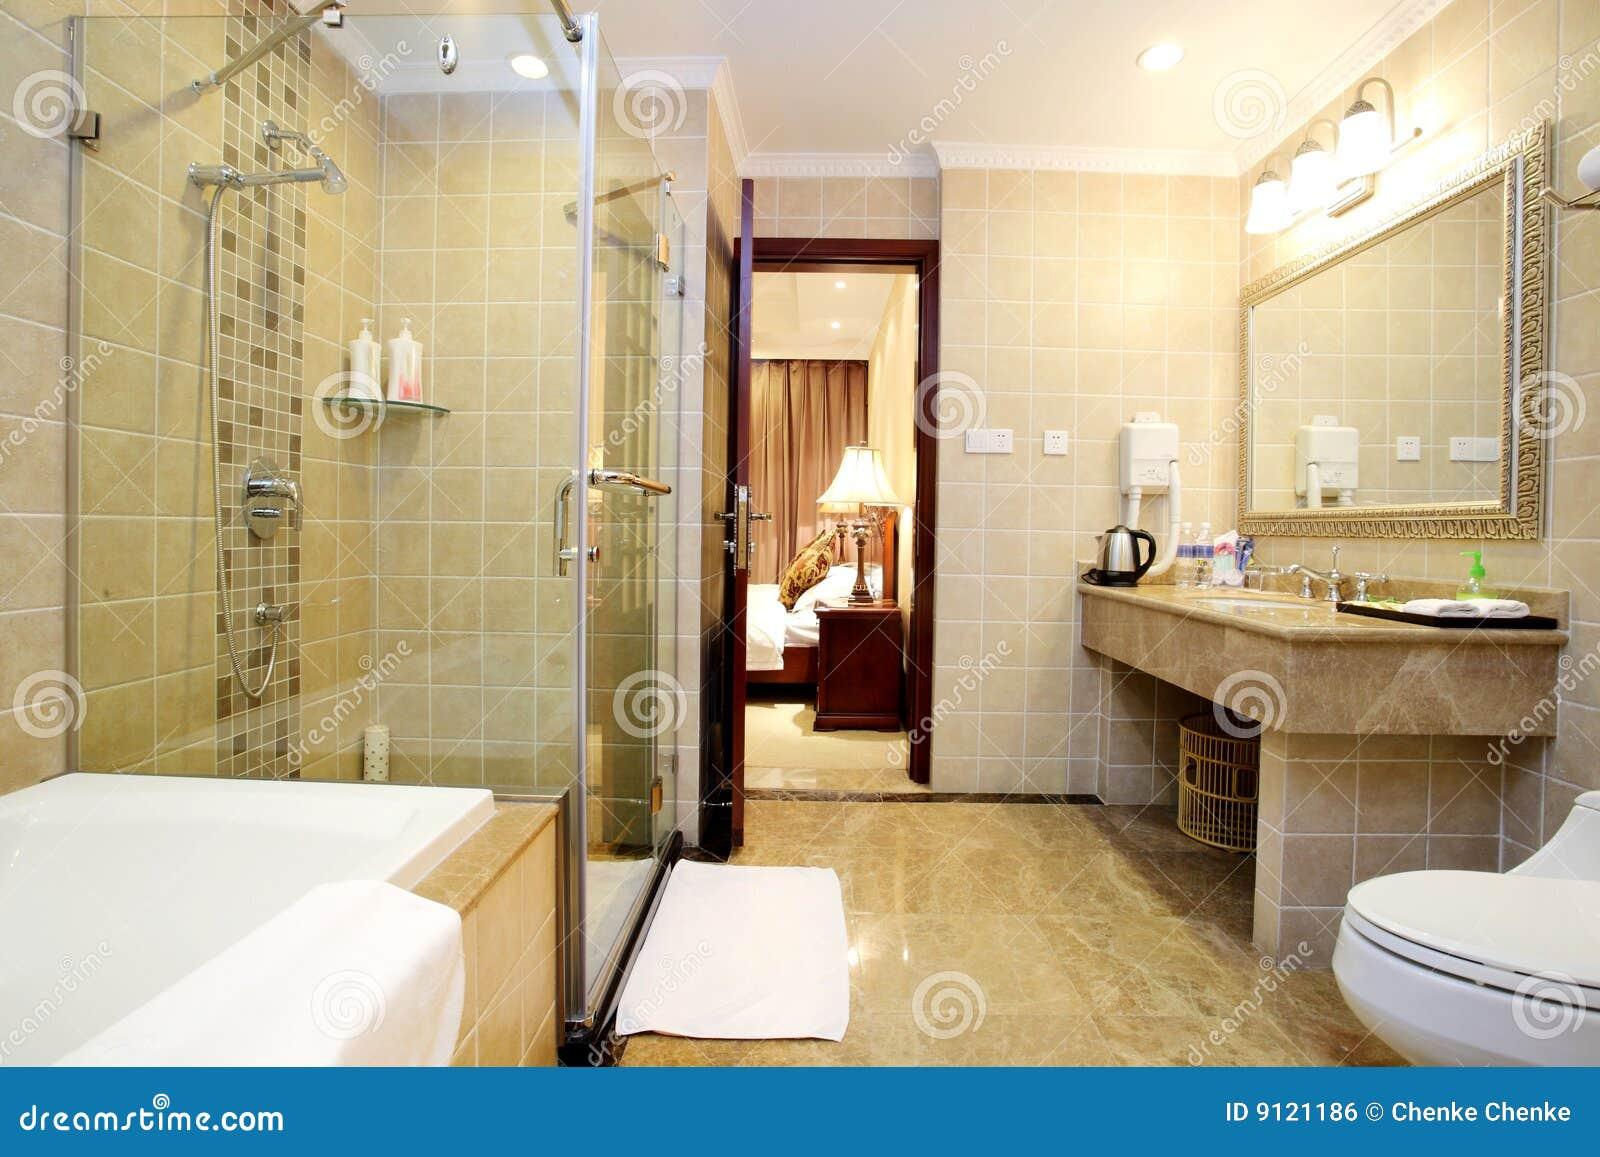 Stanza da bagno immagine stock libera da diritti immagine 9121186 - Stanza da bagno ...